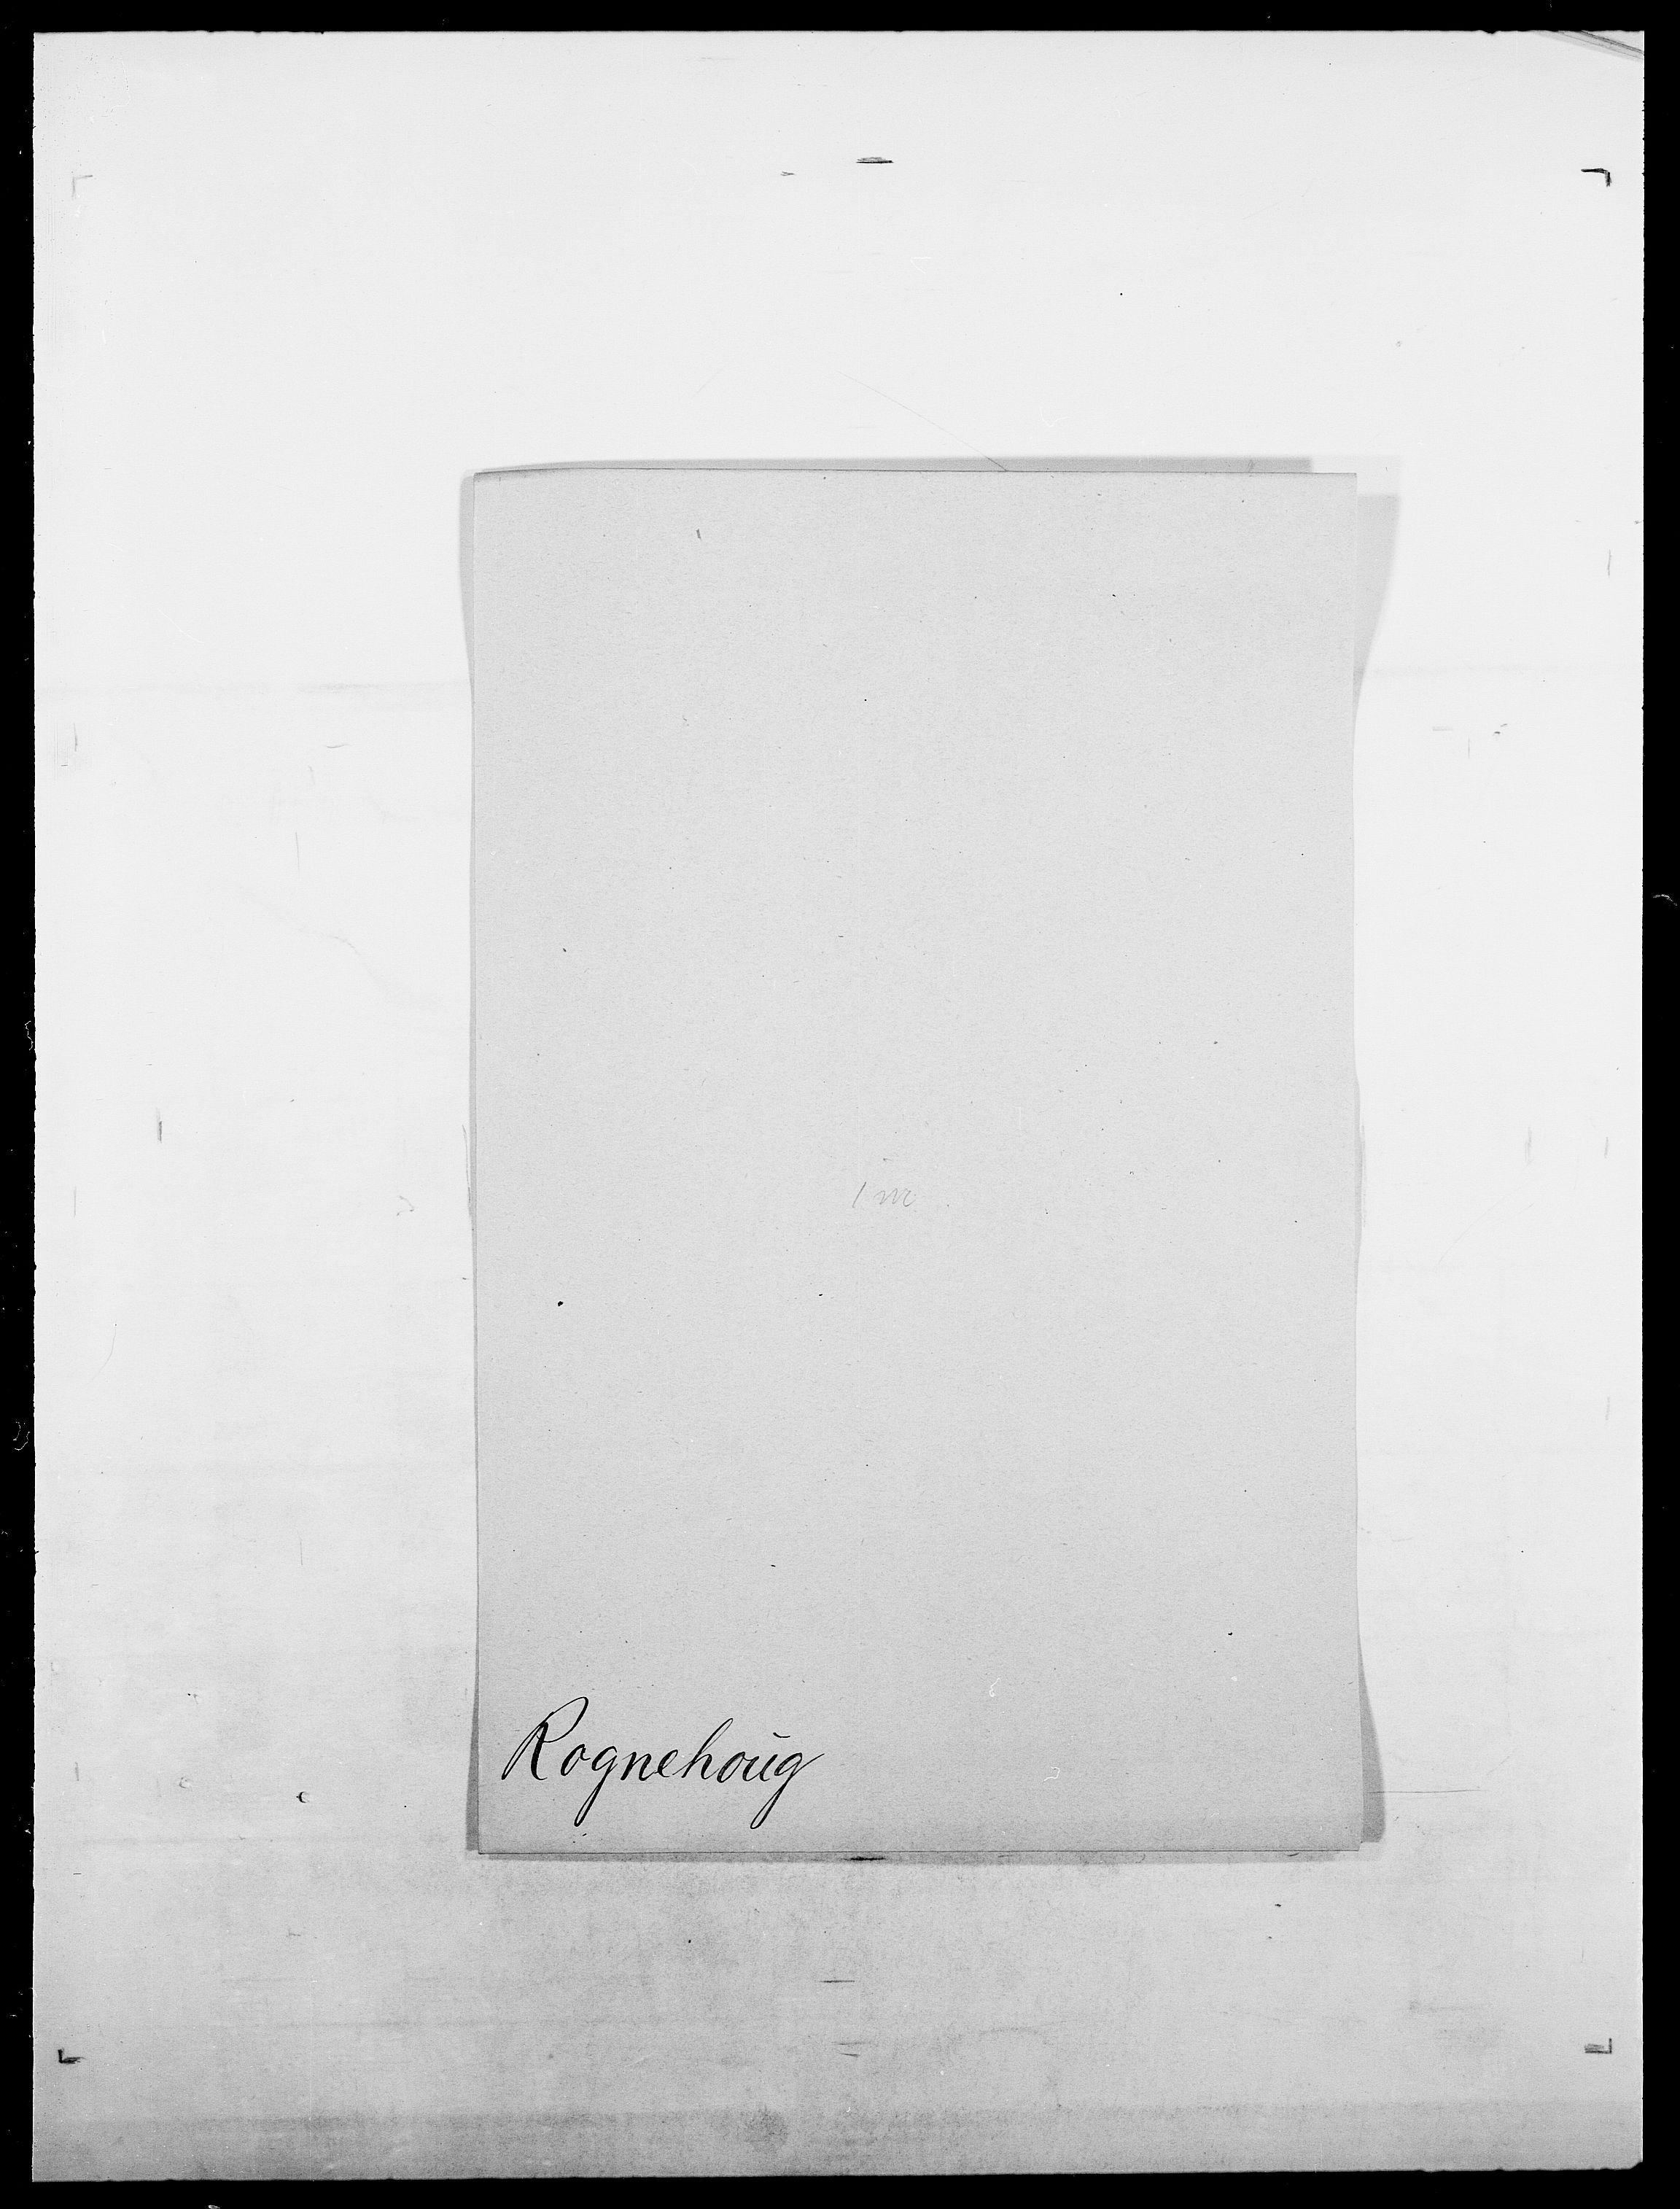 SAO, Delgobe, Charles Antoine - samling, D/Da/L0033: Roald - Røyem, s. 95